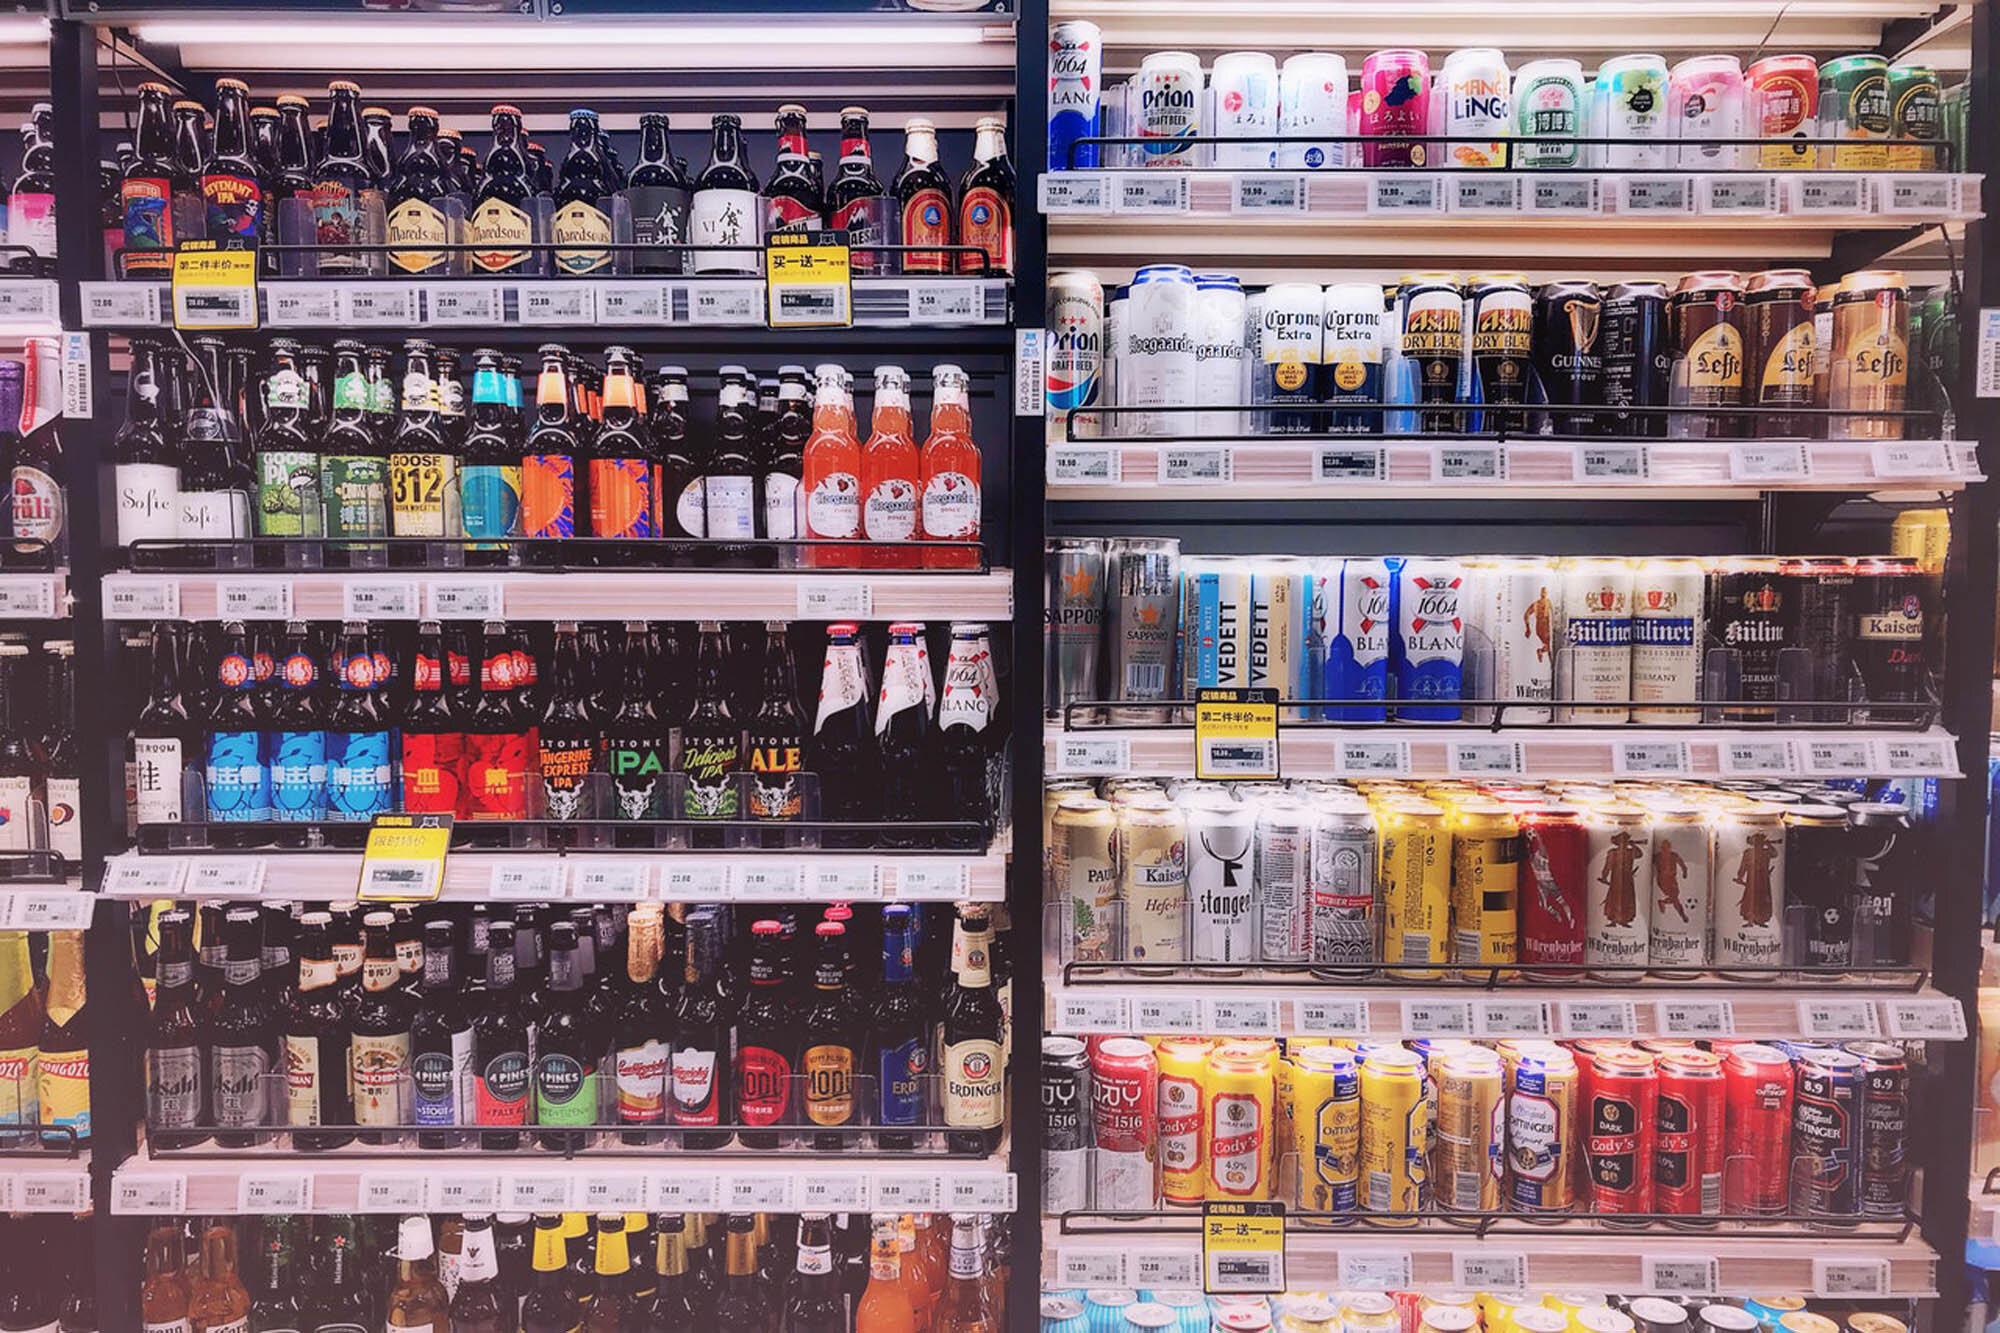 alcohol-bottles-alcoholic-beverages-beers-3028500.jpg